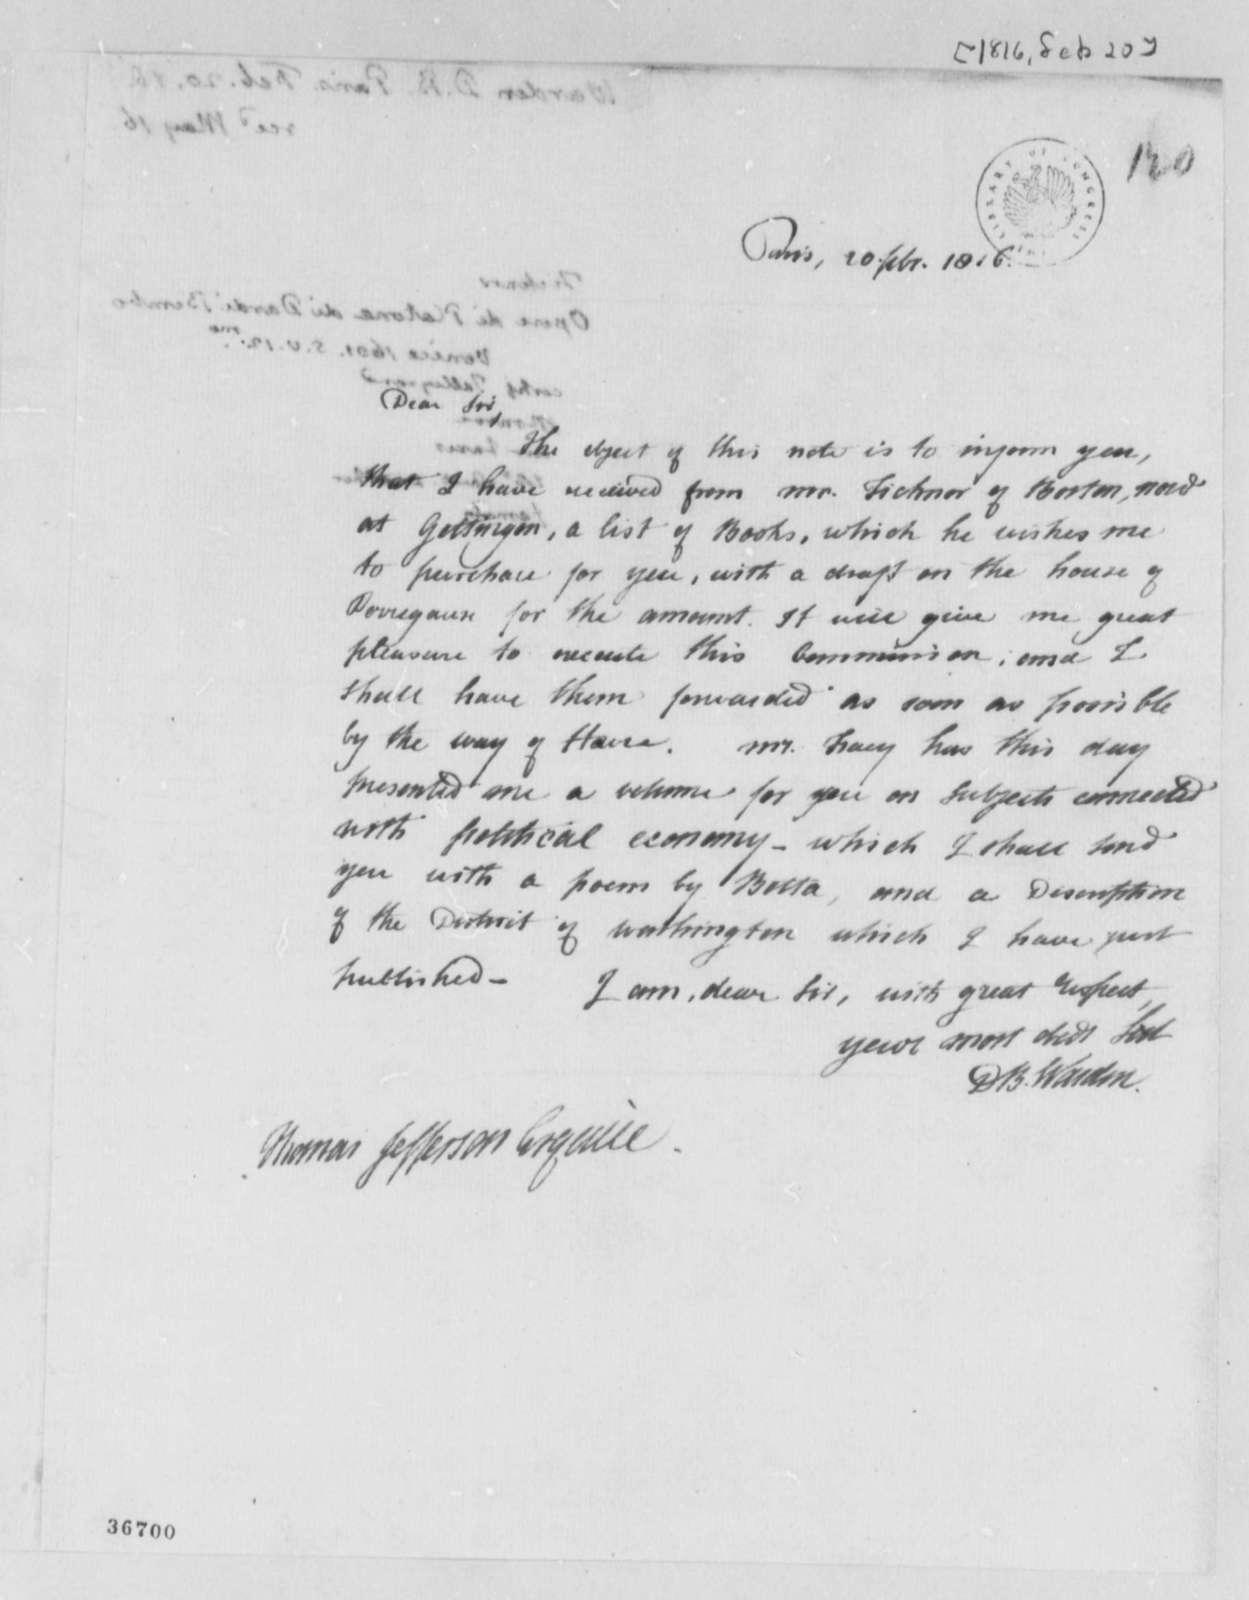 David B. Warden to Thomas Jefferson, February 20, 1816, with Thomas Jefferson Note